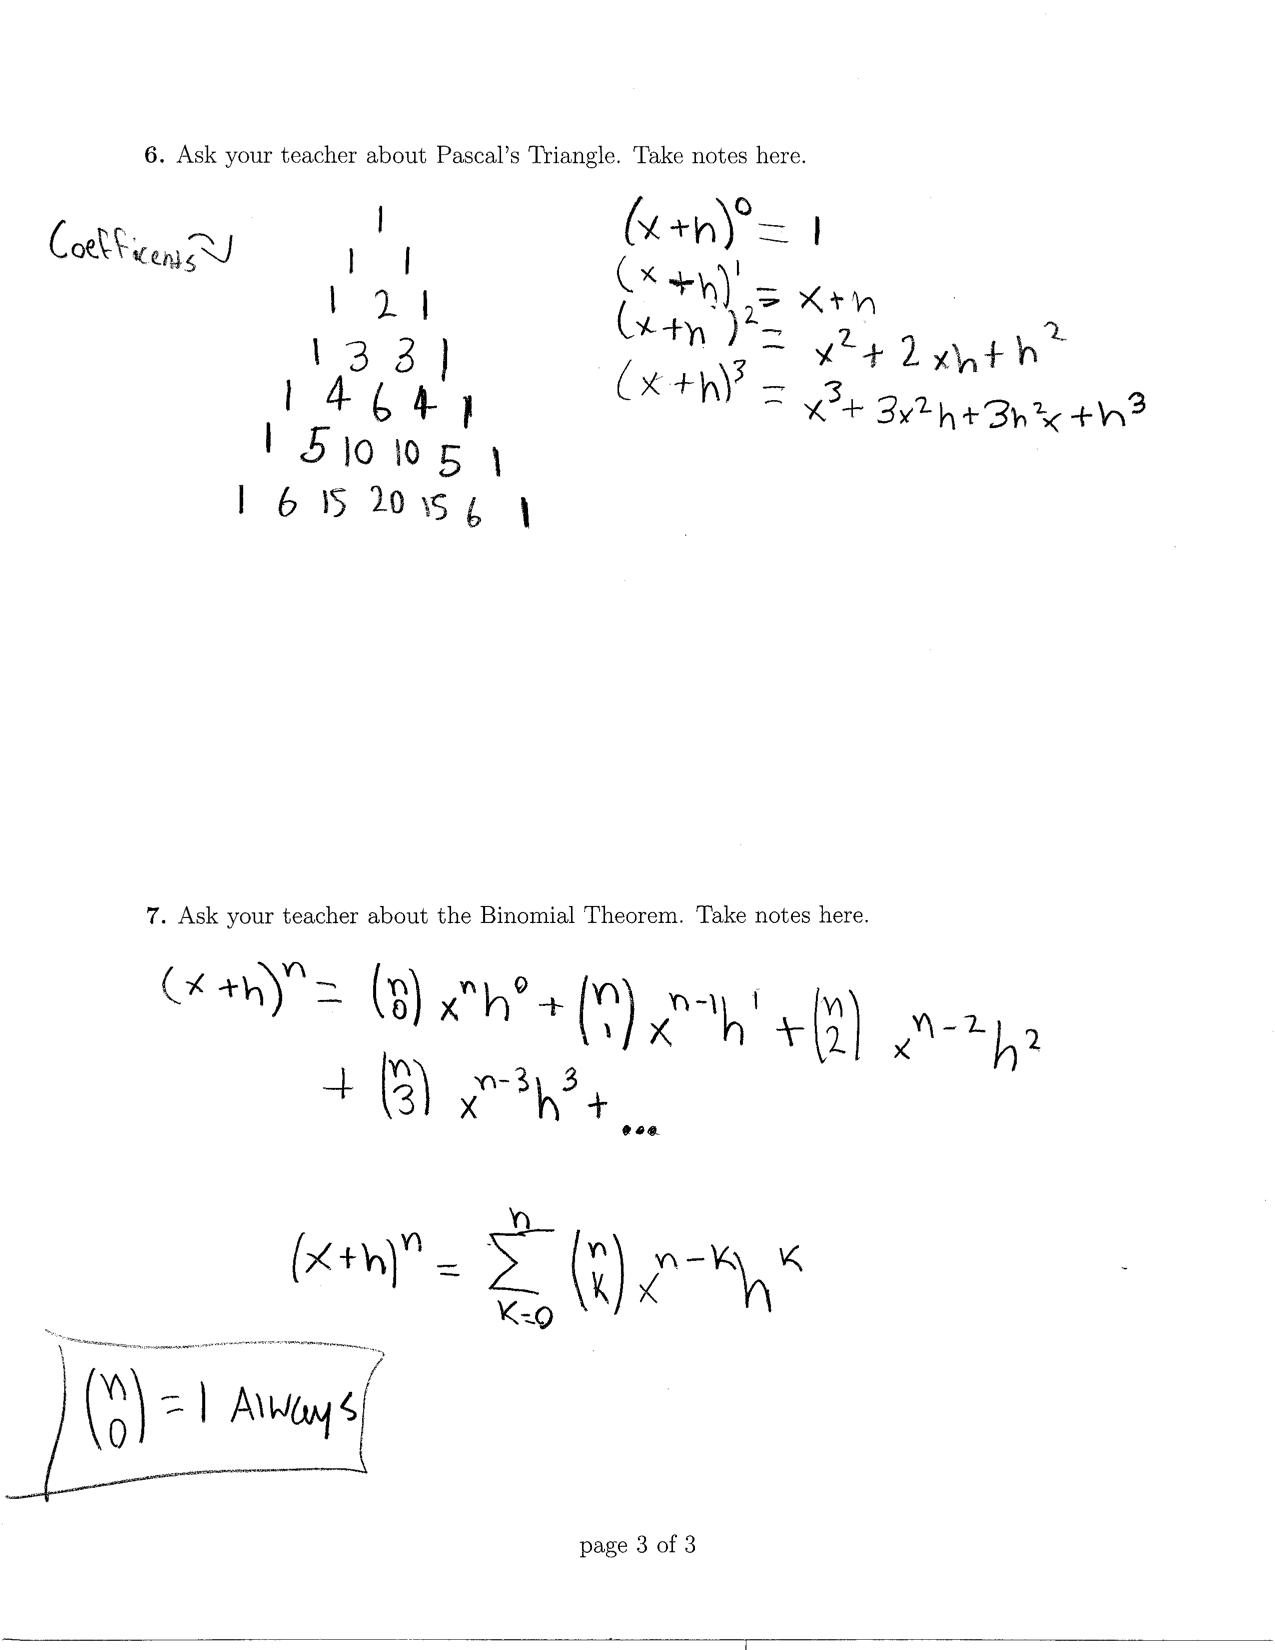 The Binomial Theory